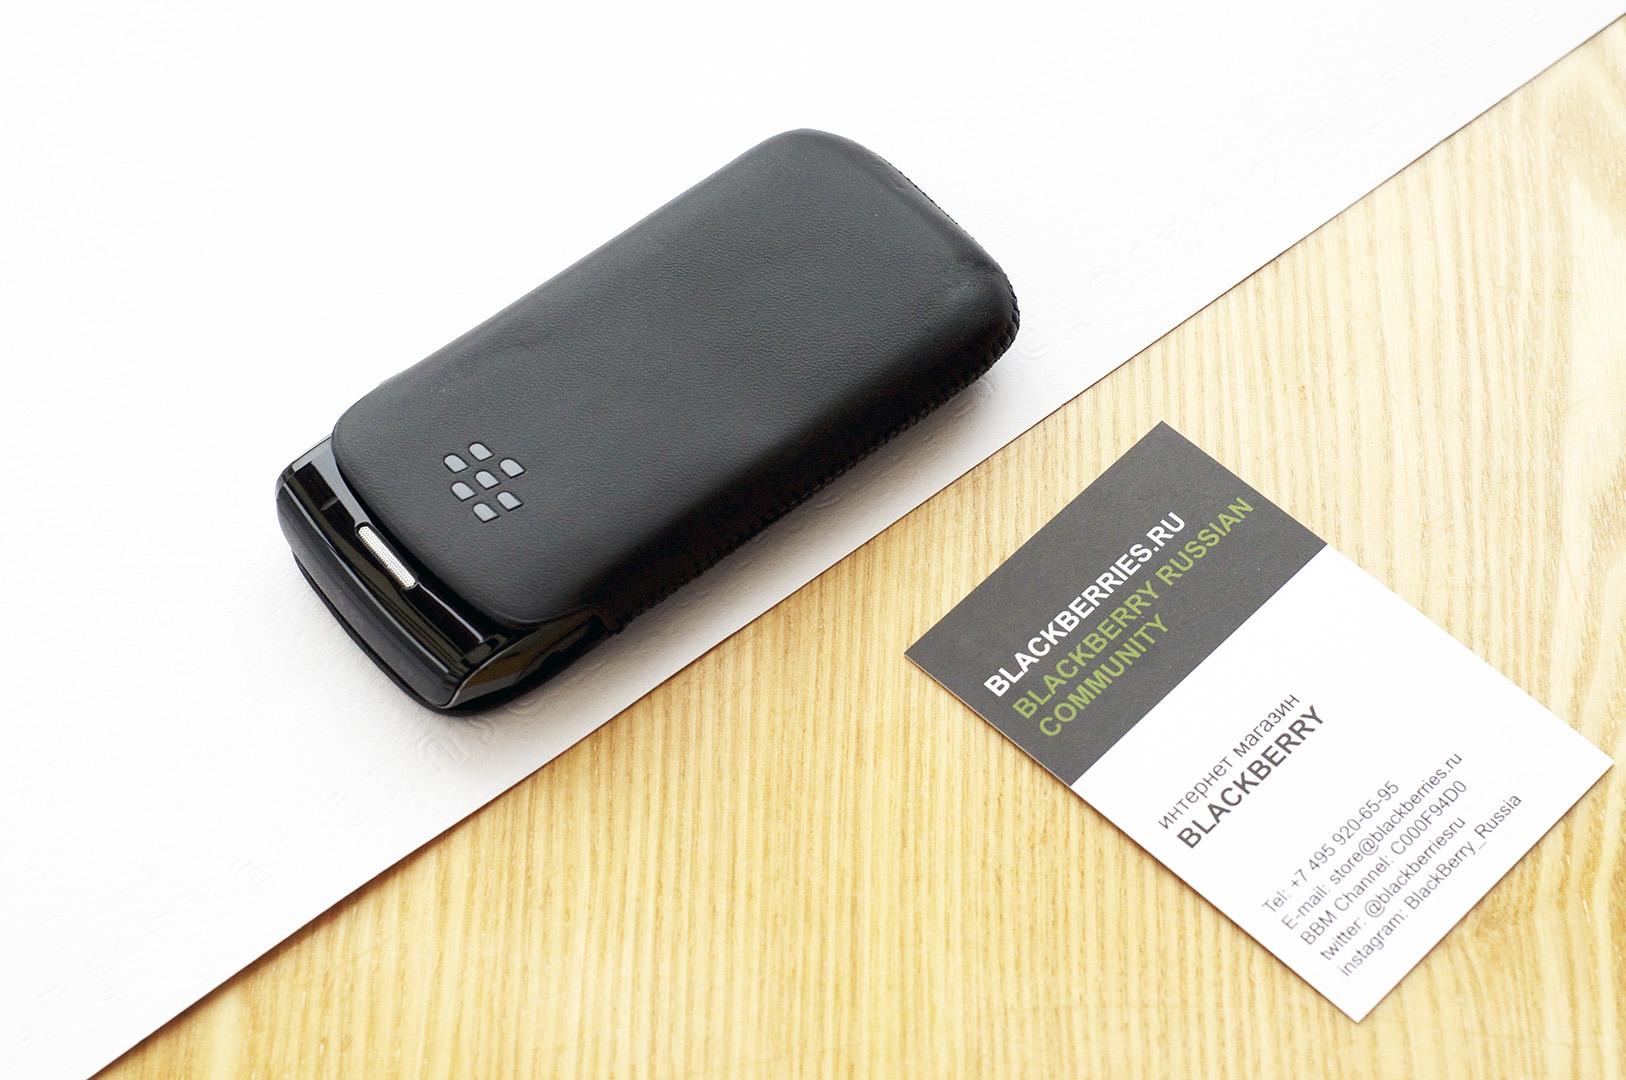 blackberry-9100-pearl-3g-12